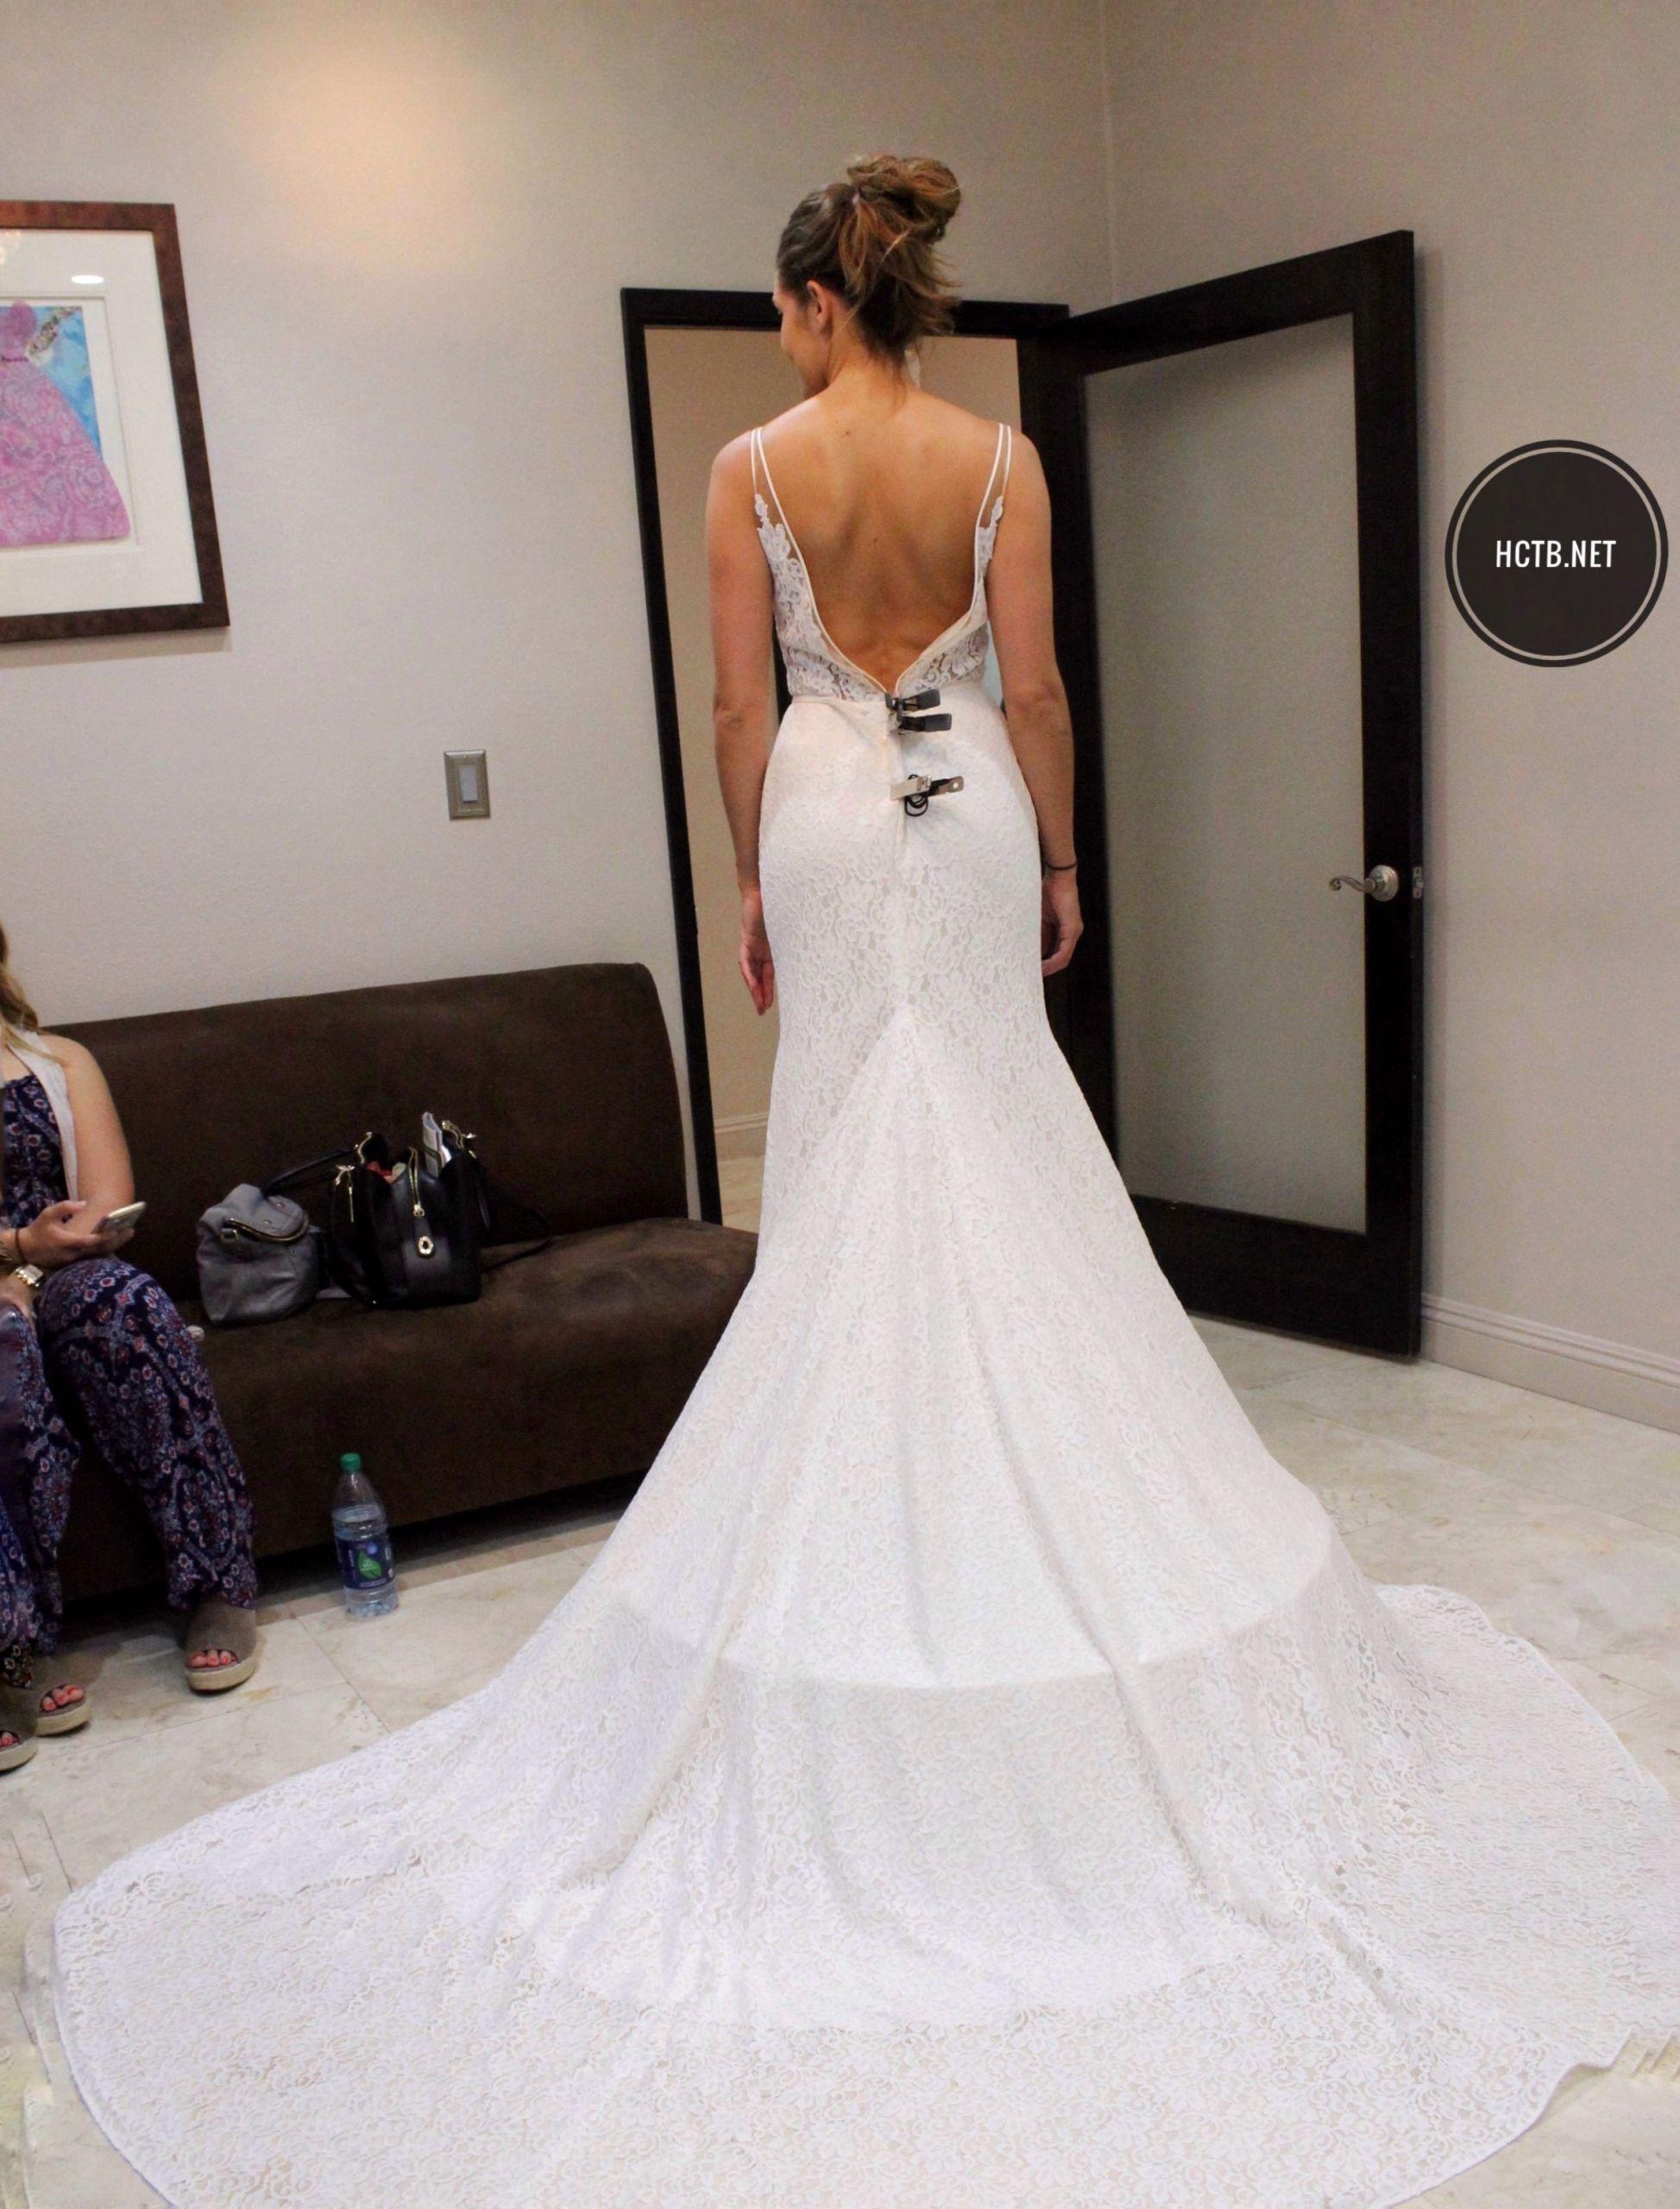 Wedding Gowns San Diego  Wedding Dresses at Here es The Bride in San Diego